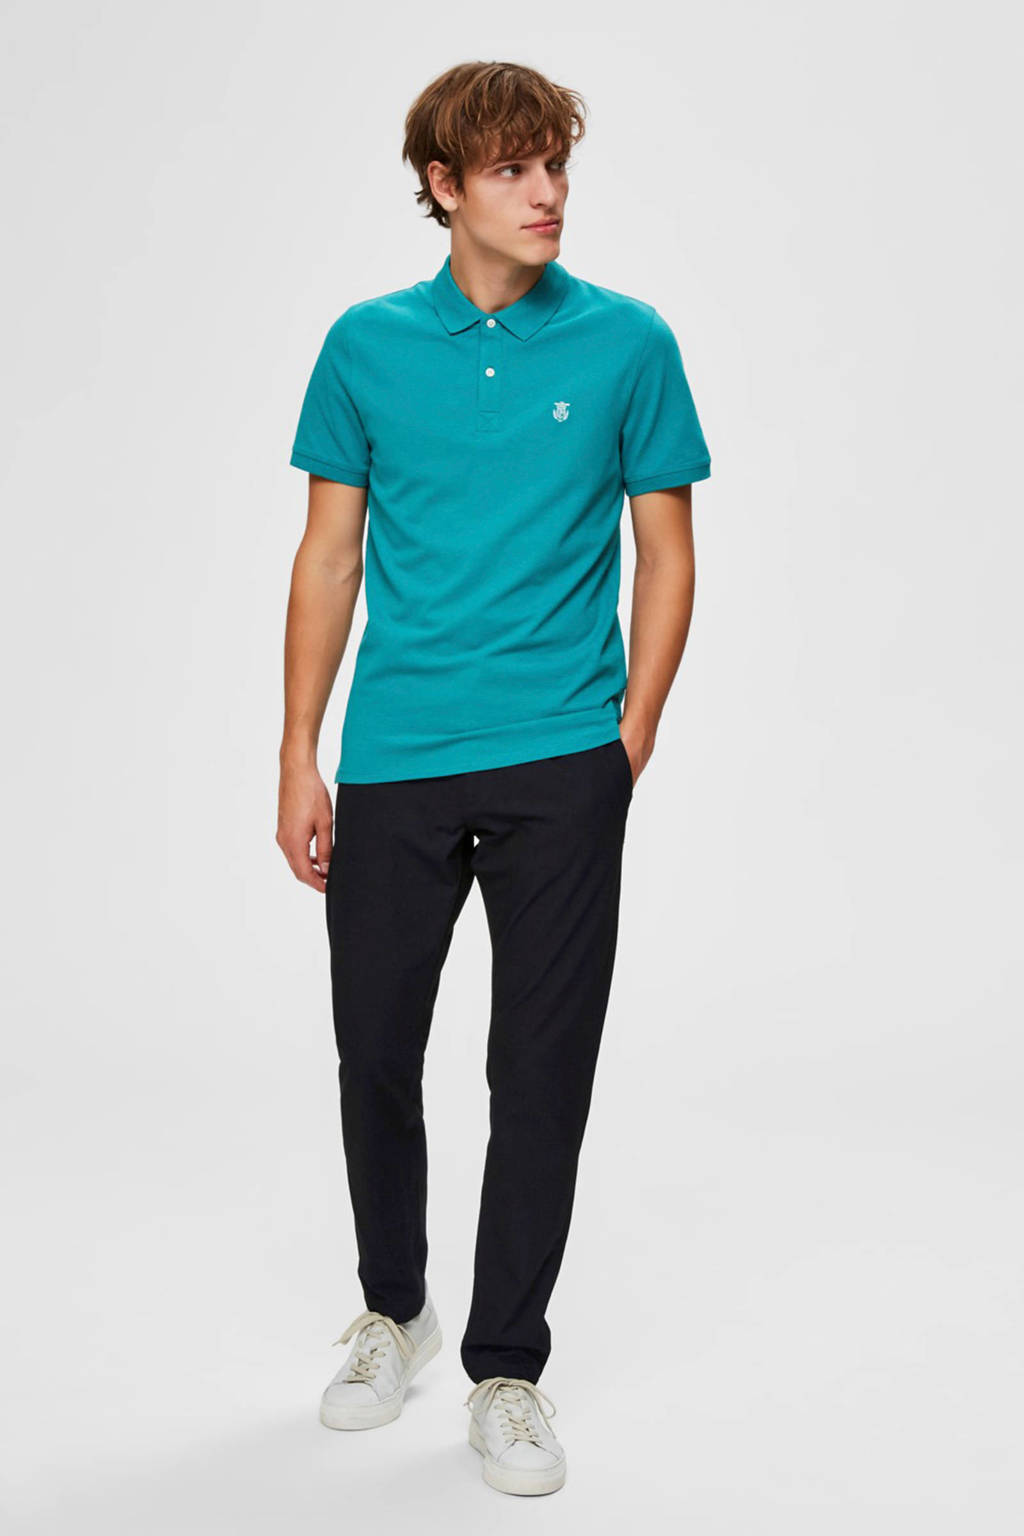 SELECTED HOMME slim fit polo met biologisch katoen turquoise, Turquoise